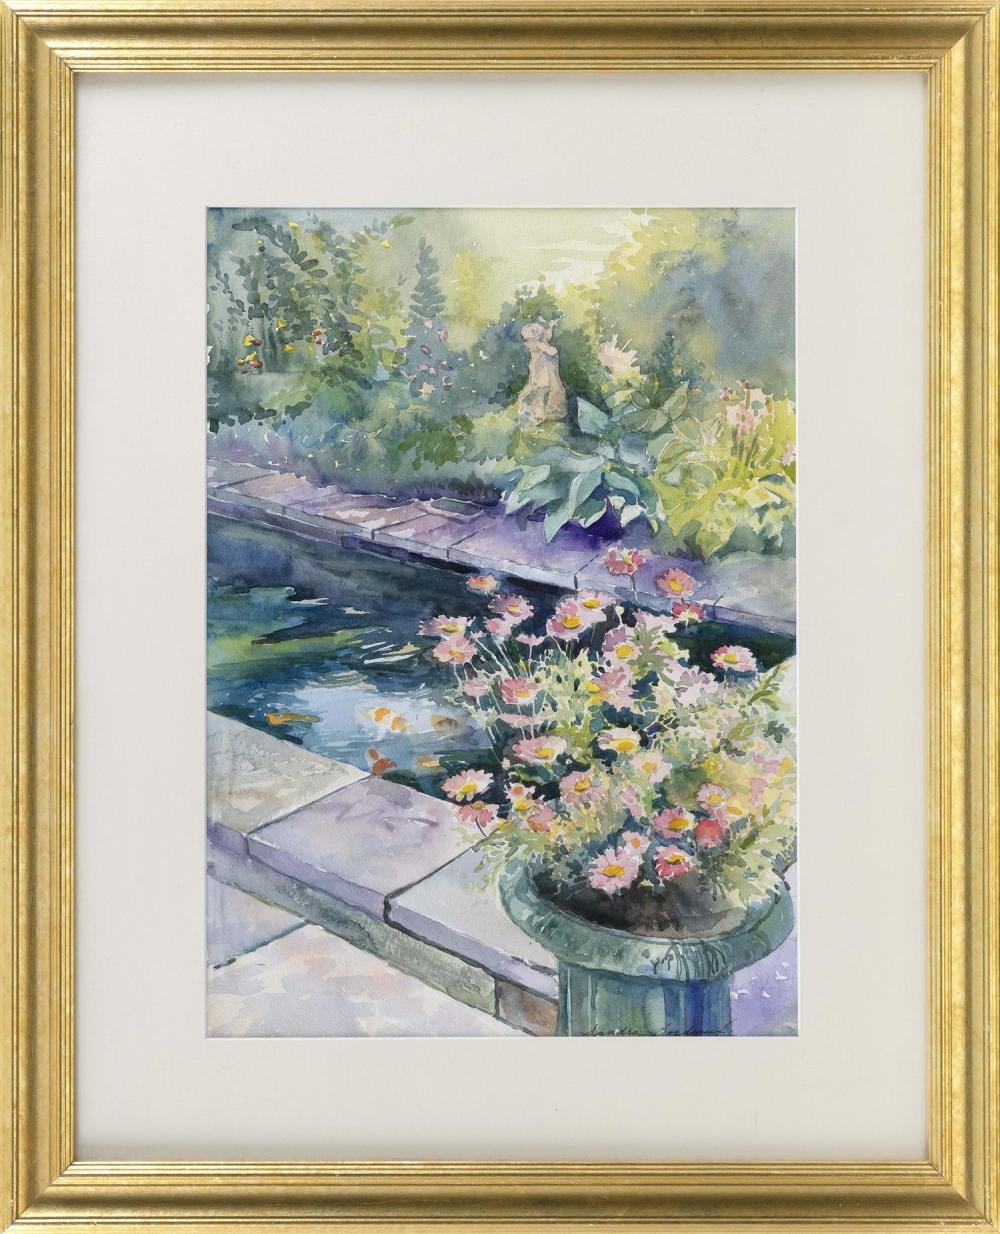 "SANDRA BORDEAUX, Cape Cod, Massachusetts, Contemporary, Koi pond., Watercolor on paper, 21"" x 15"" sight. Framed 32"" x 25.5""."